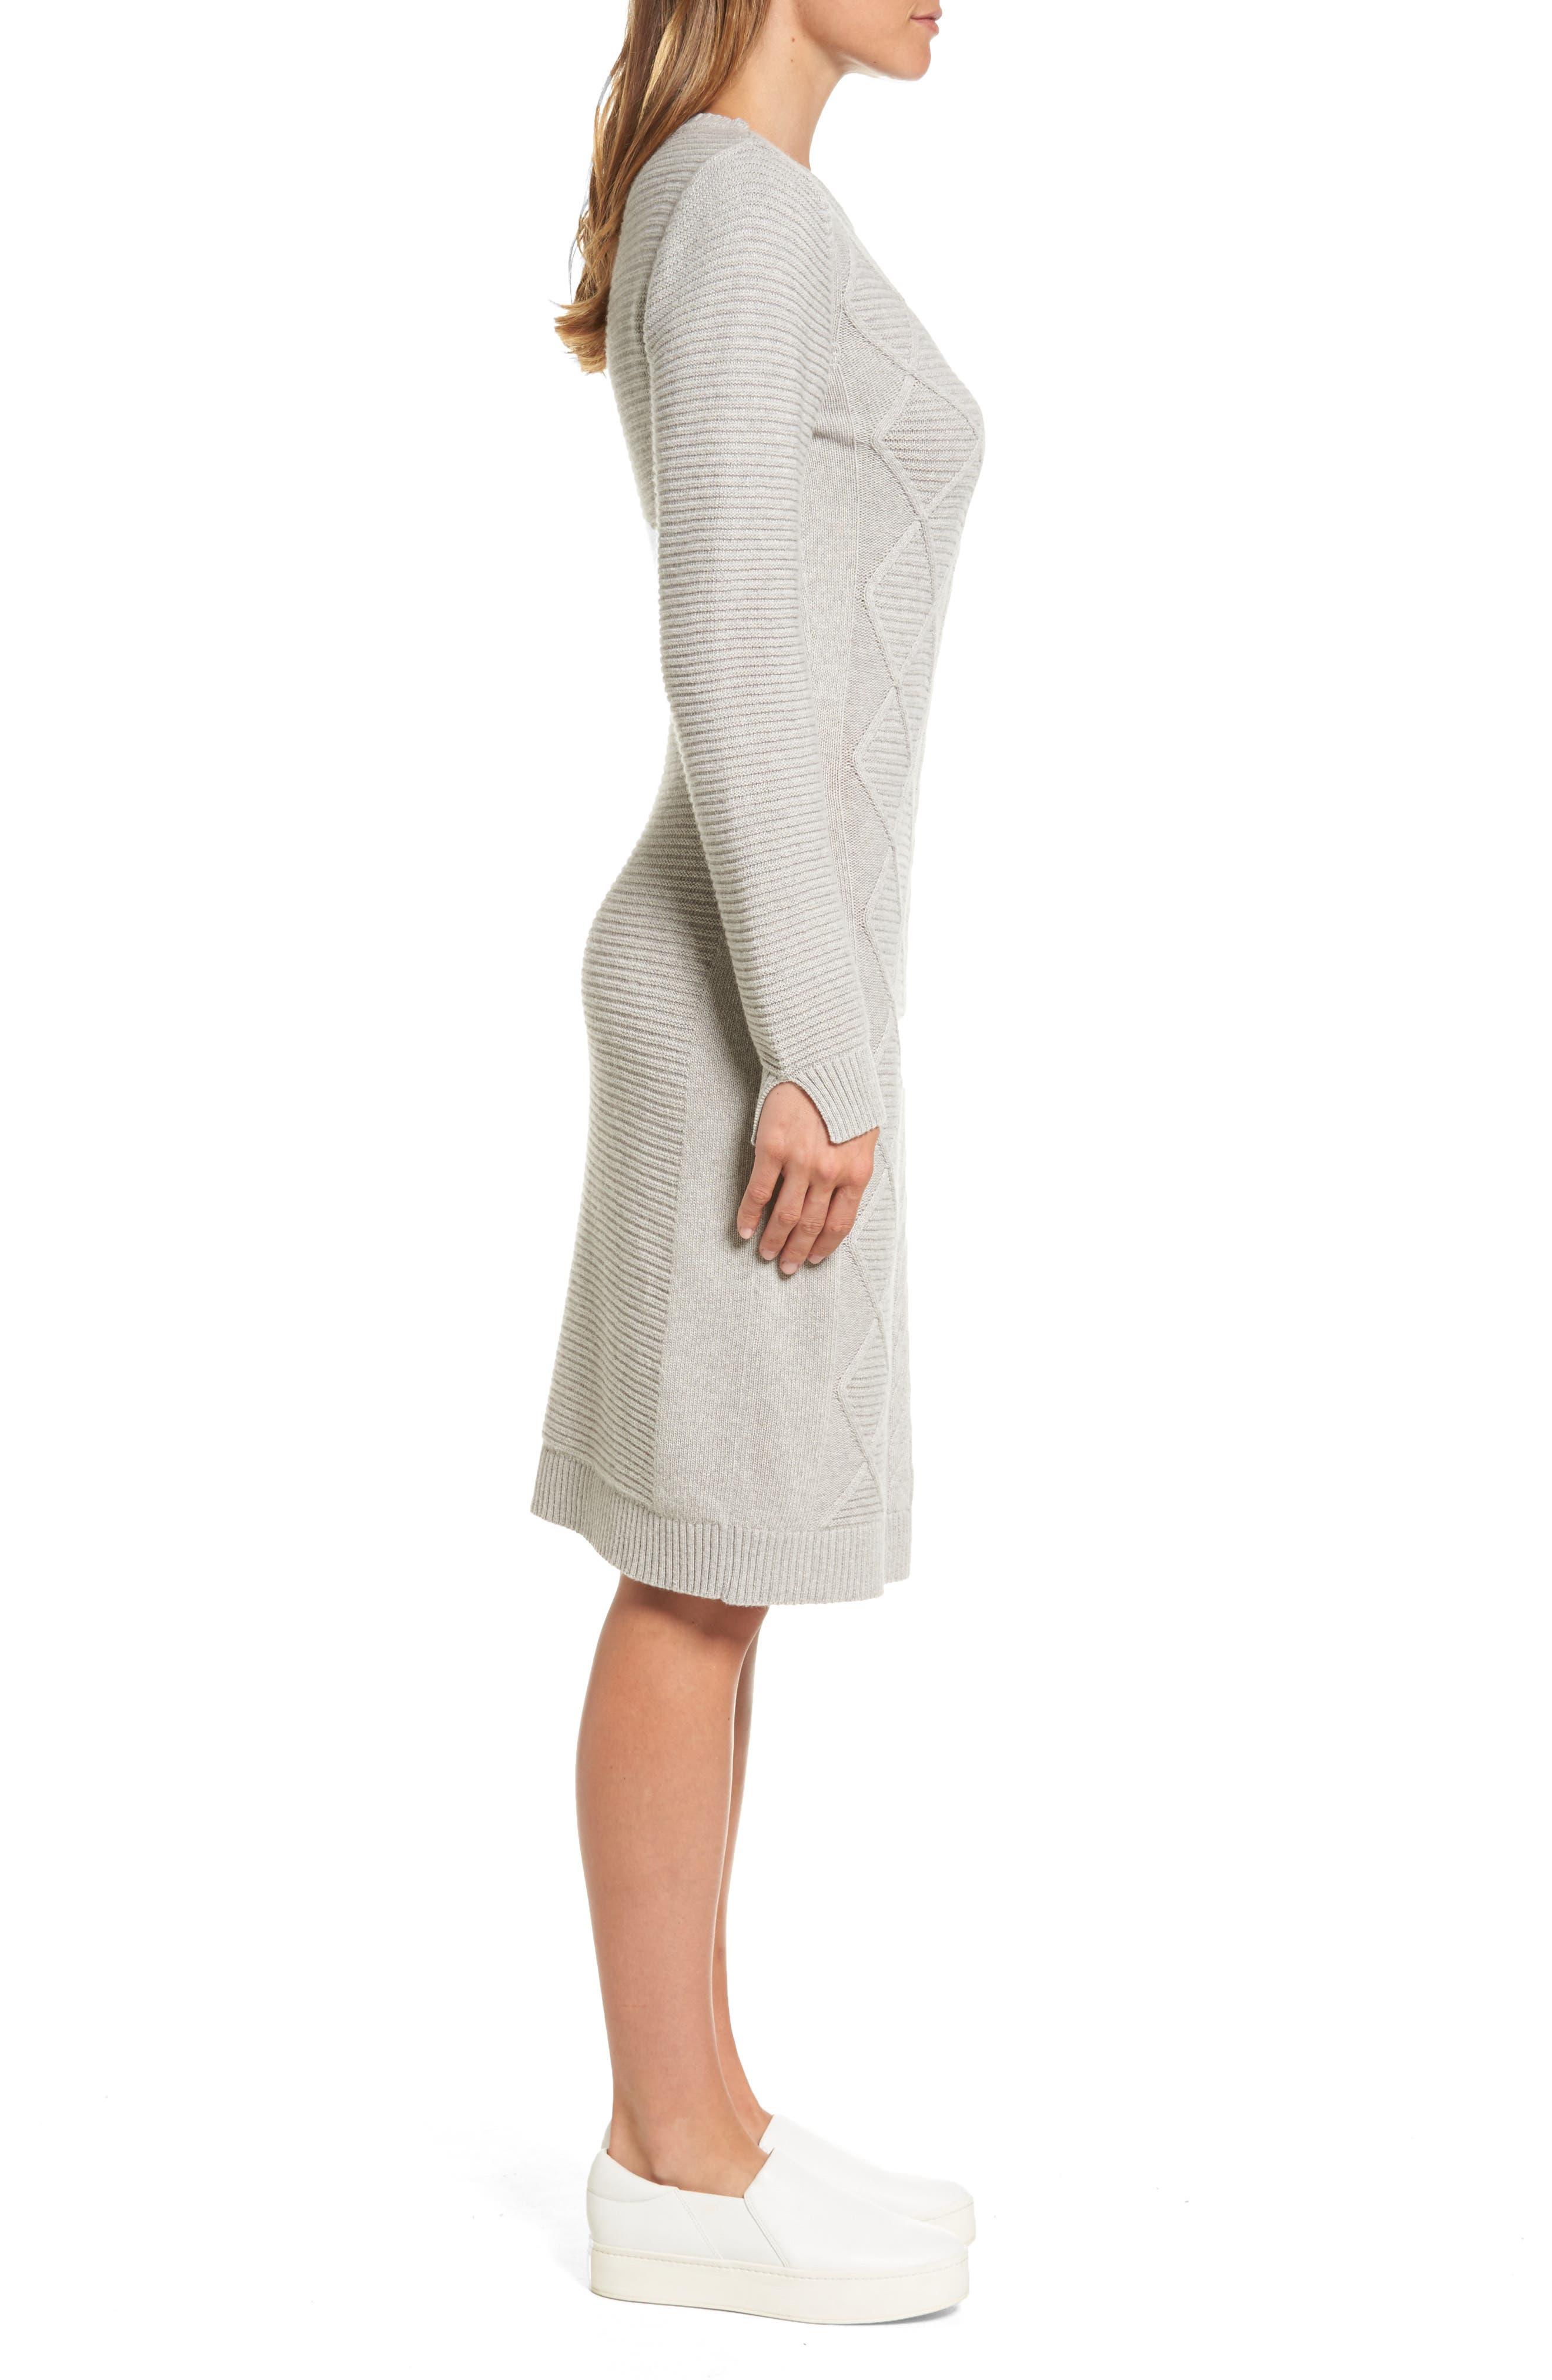 Emmanuel Cable Knit Sweater Dress,                             Alternate thumbnail 3, color,                             050